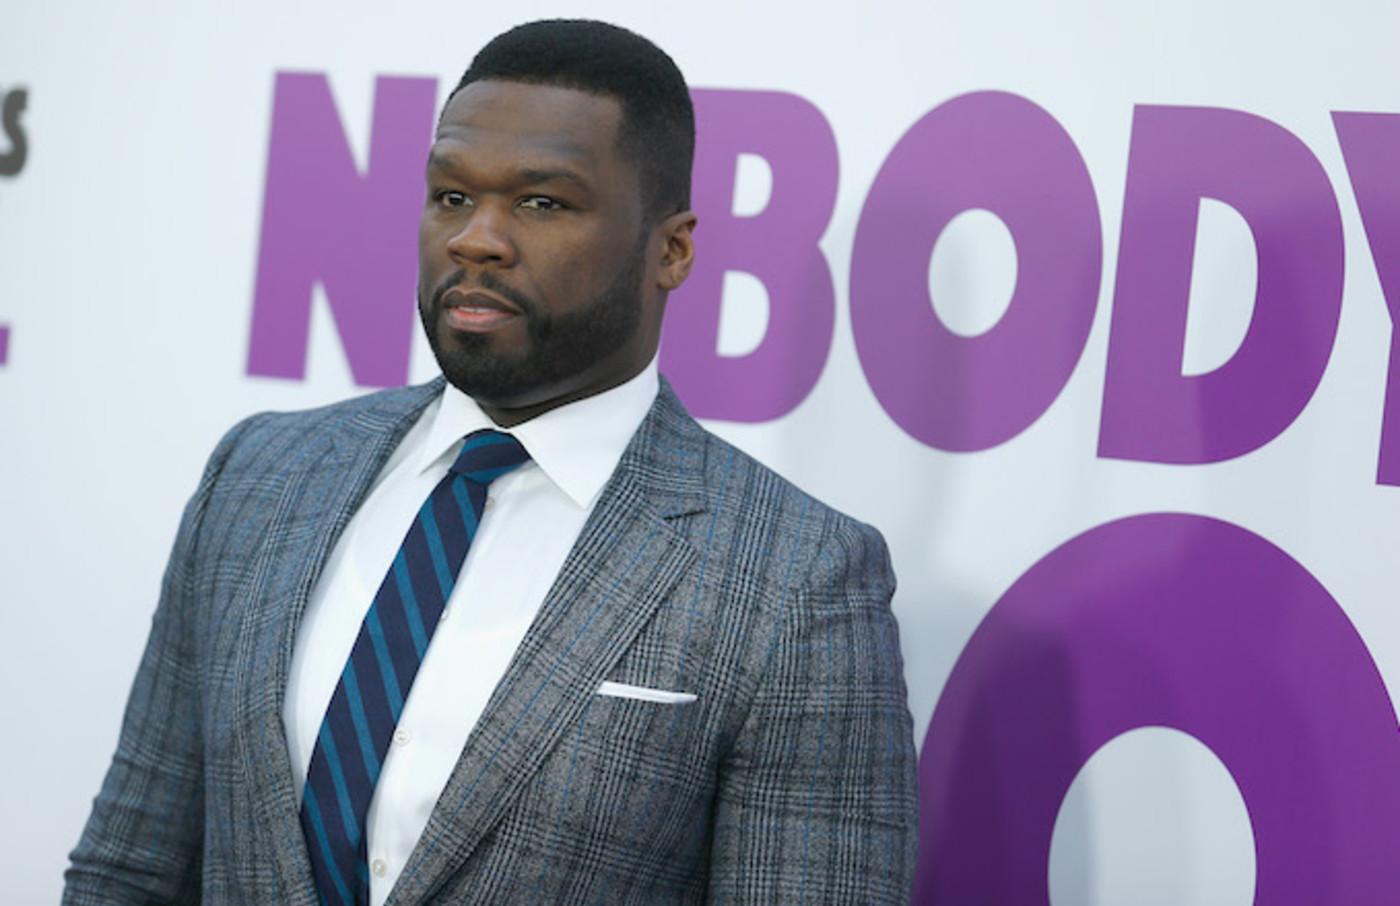 50 Cent 6ix9ine son